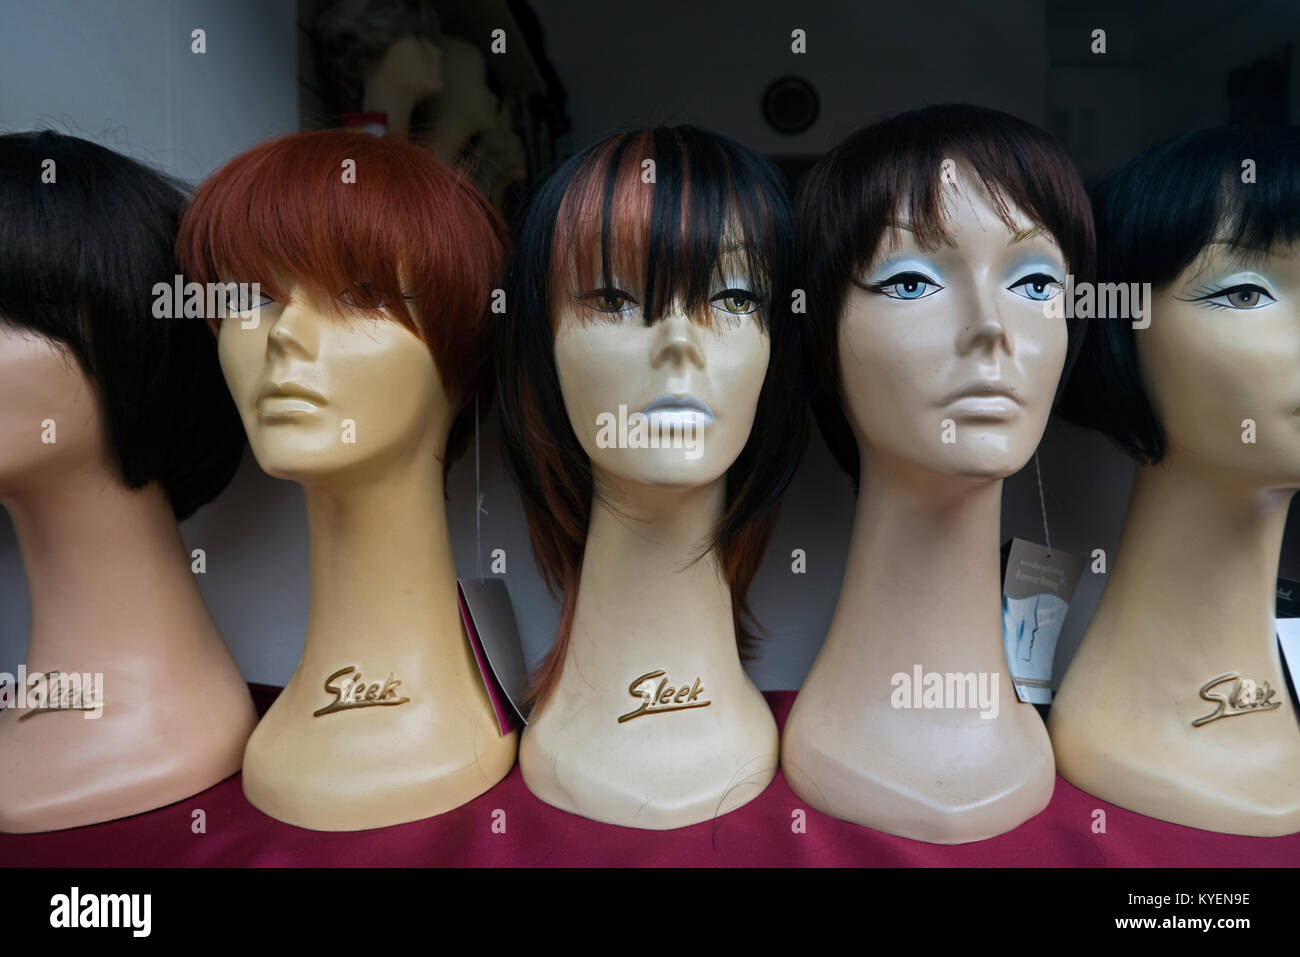 Vintage female mannequin heads in a shop window in Edinburgh. - Stock Image